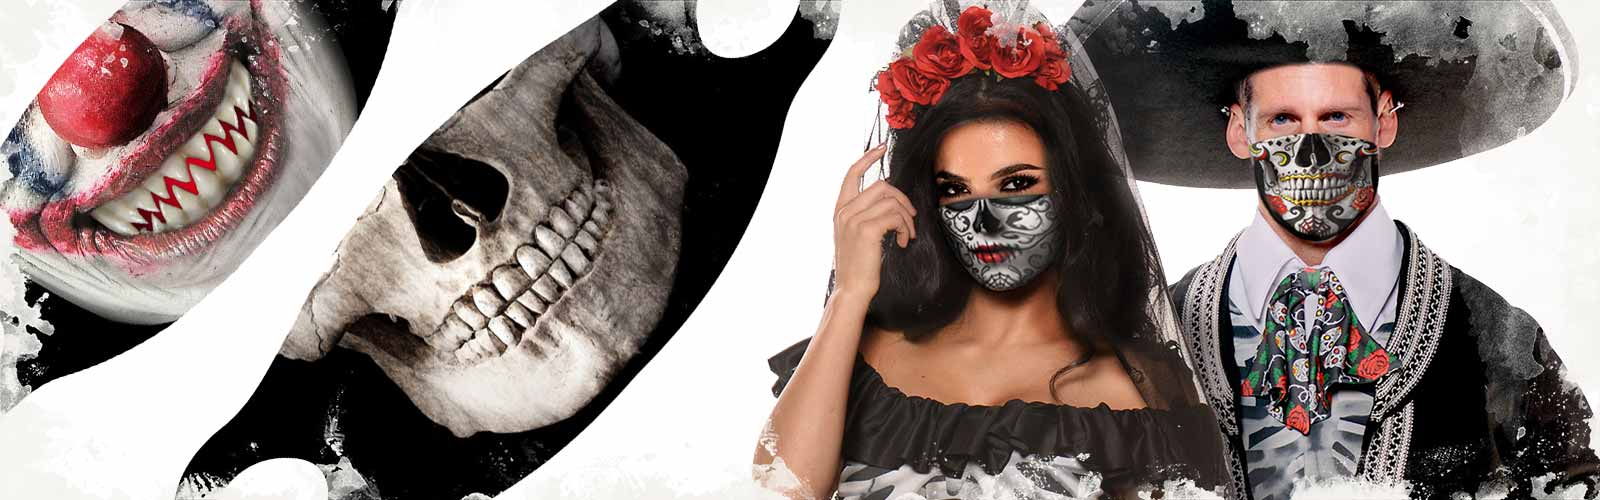 Halloween Trends 2020 - Halloween Mundmasken